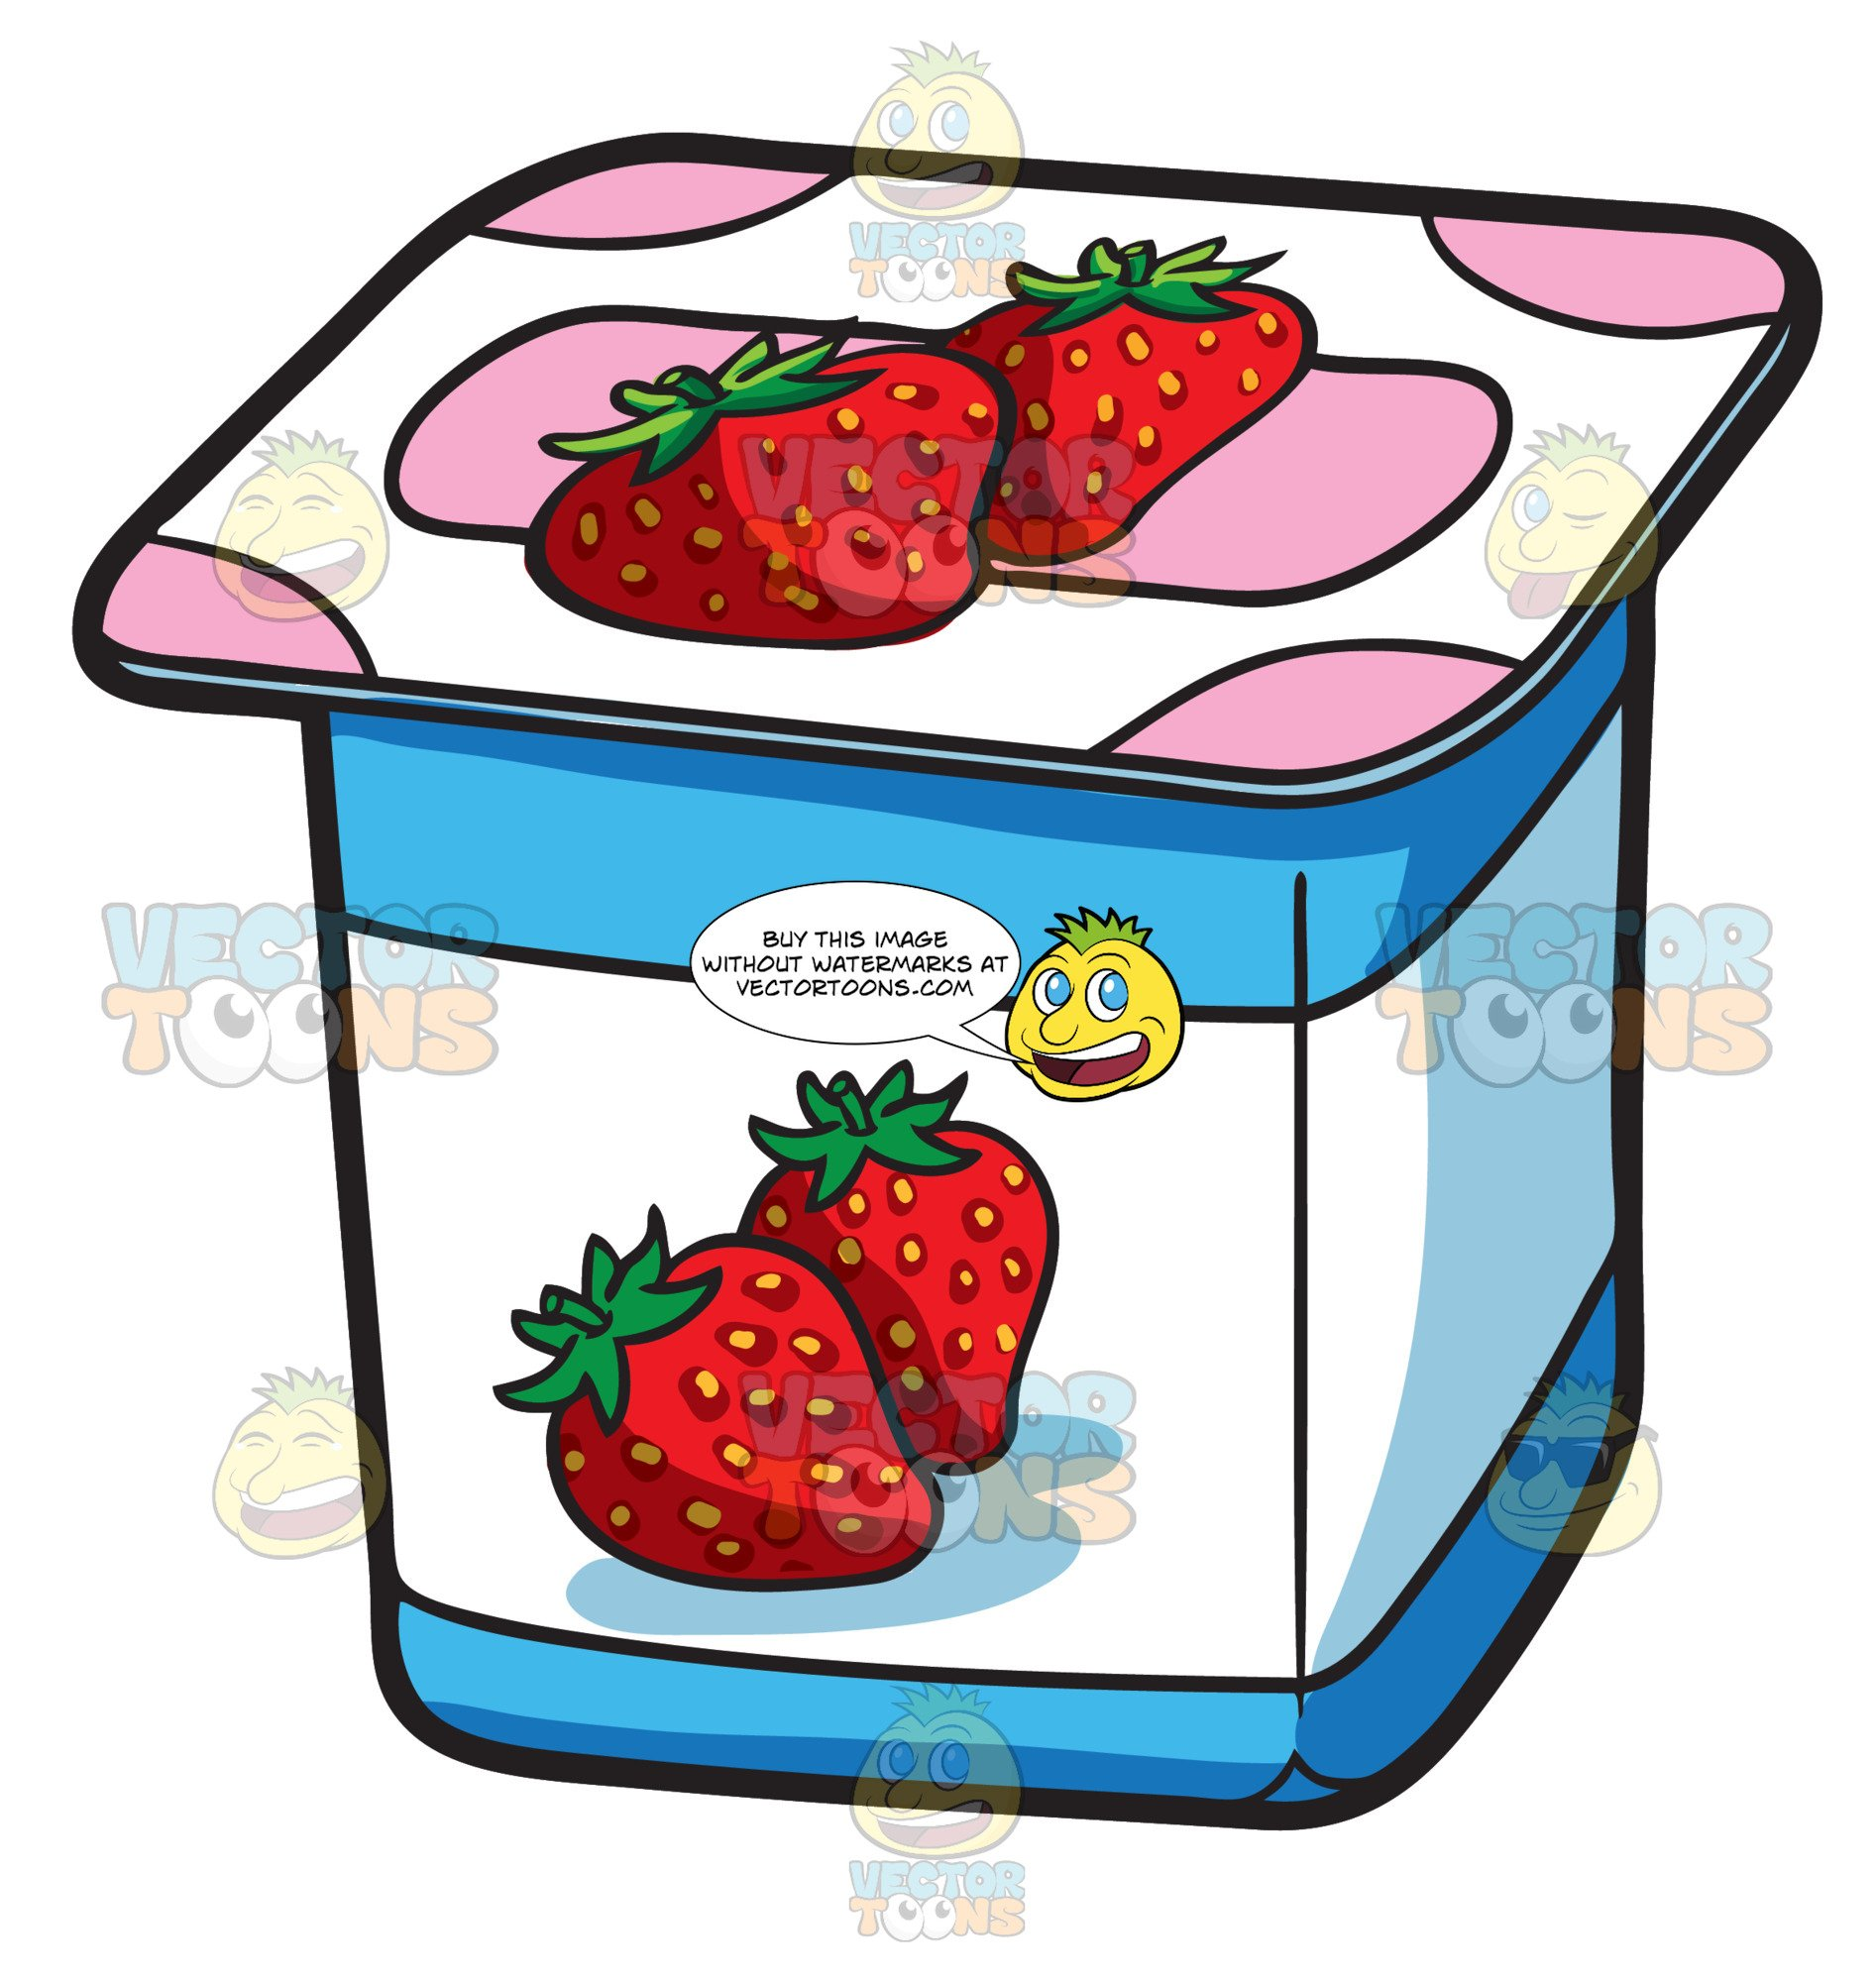 Yogurt clipart yogurt container. A one serving strawberry